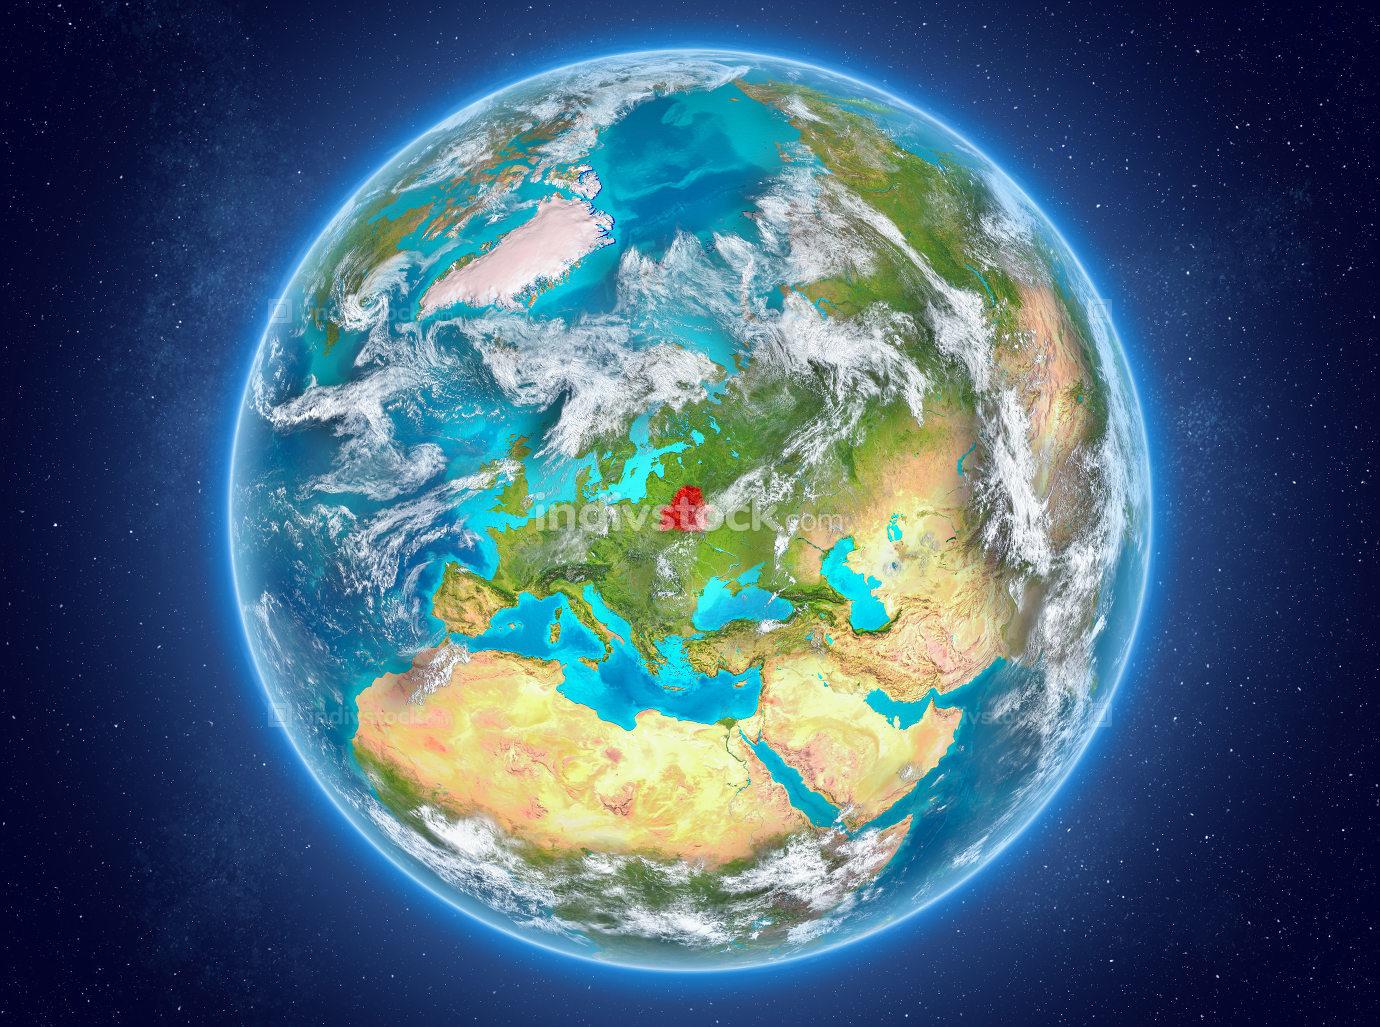 Belarus on planet Earth in space